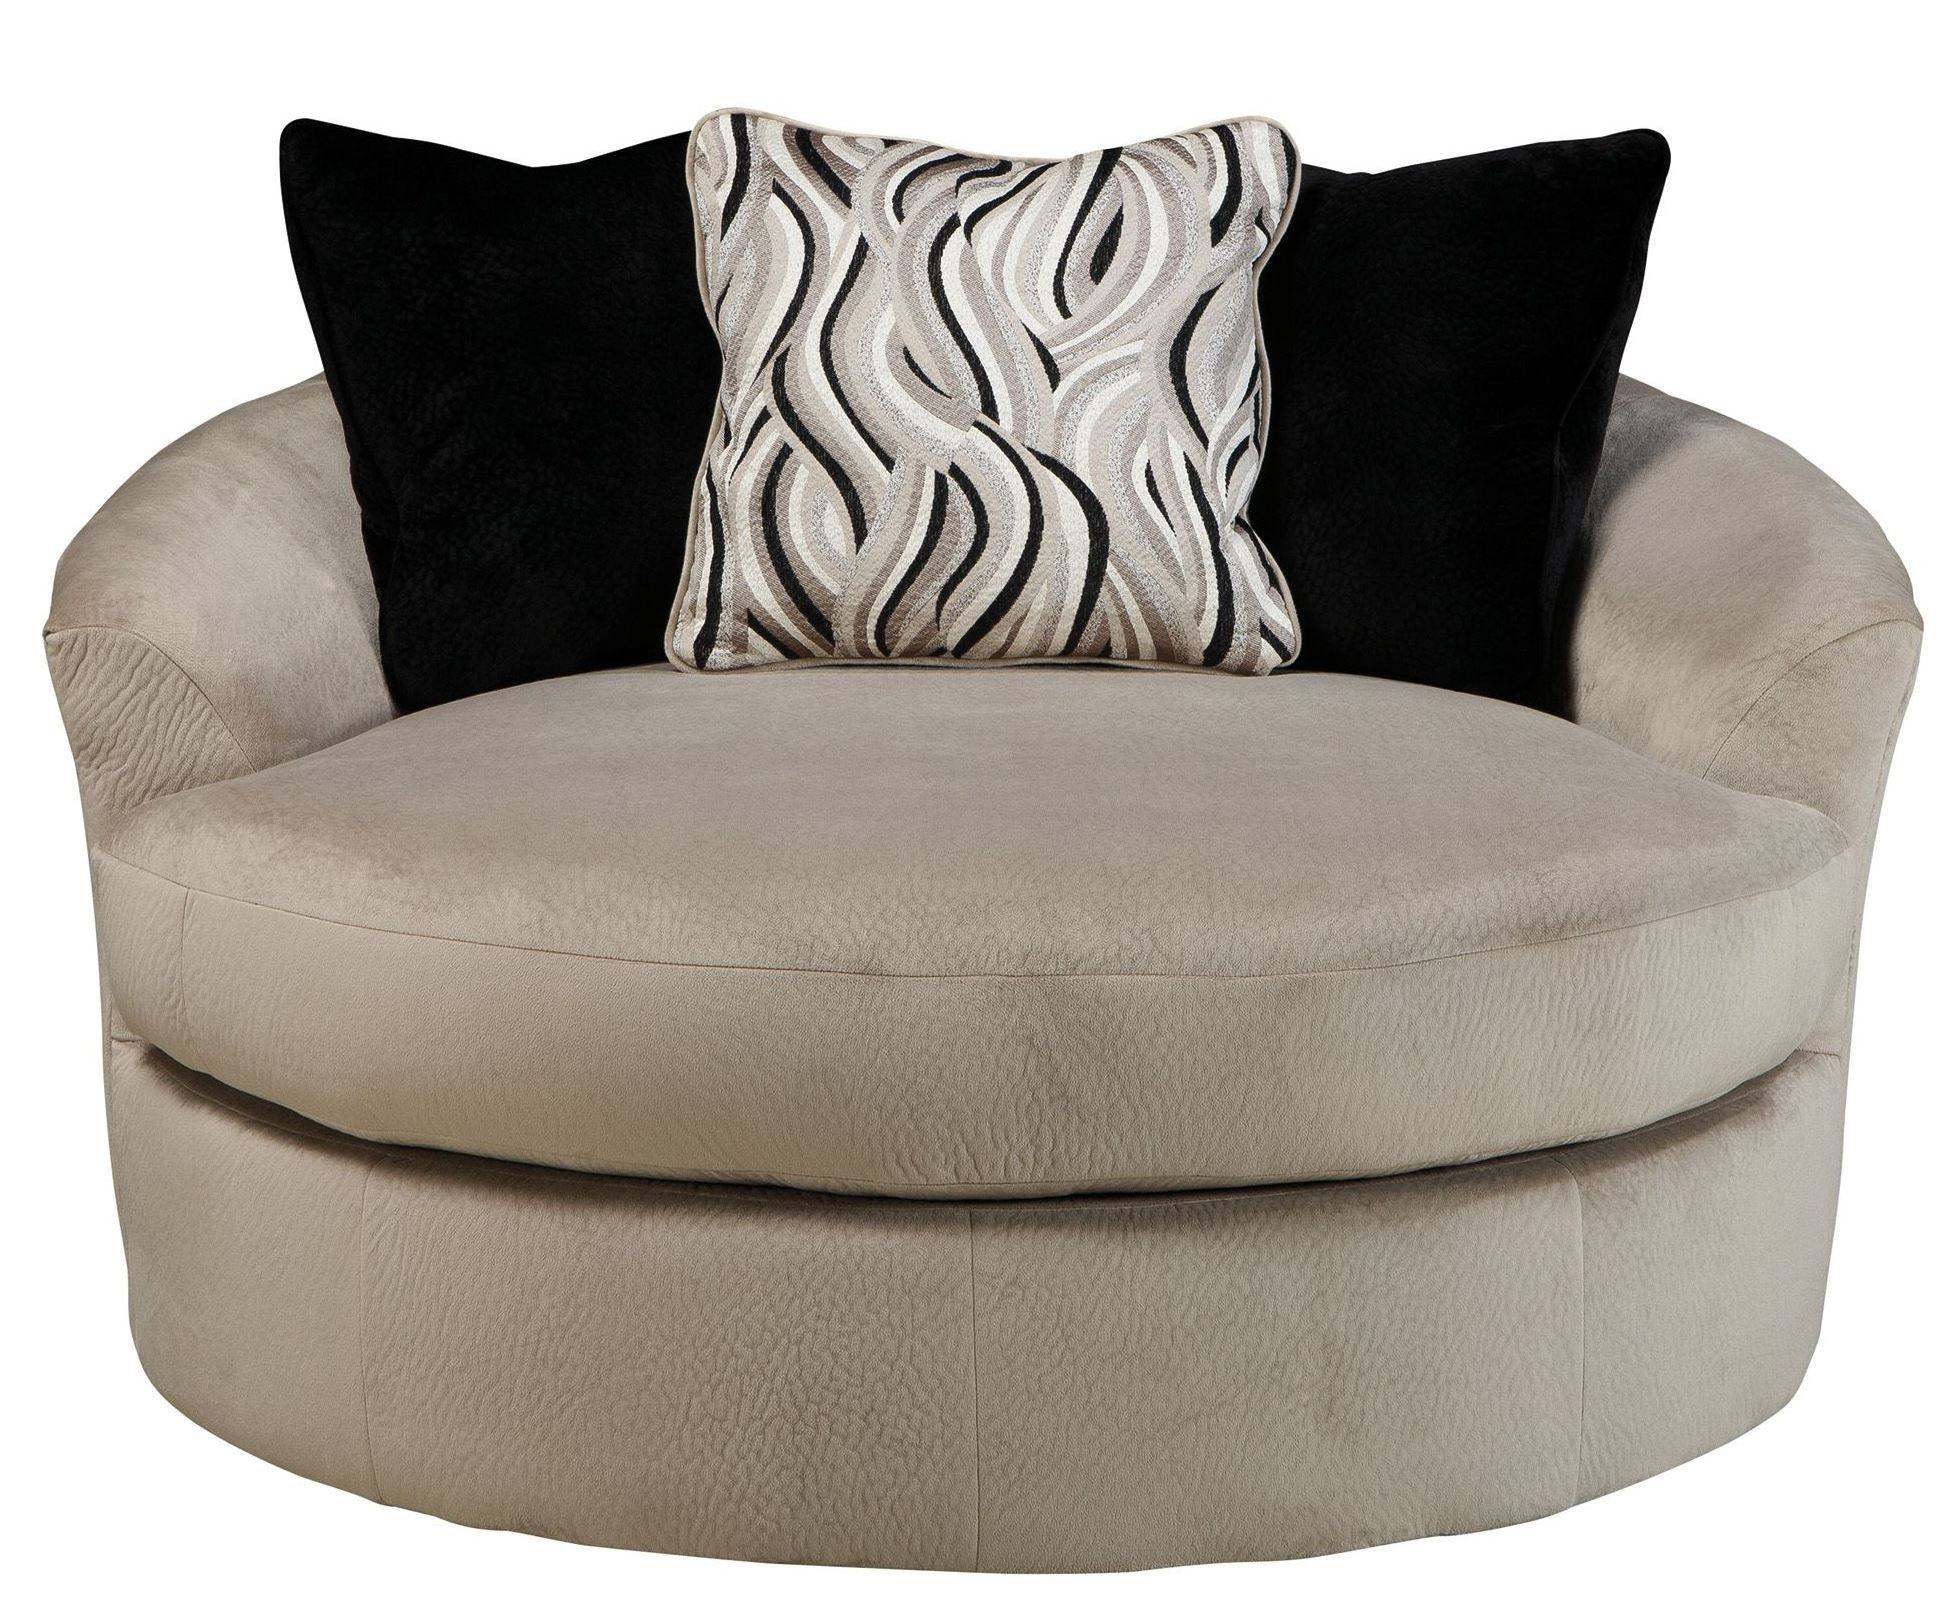 Heflin Pebble Oversized Swivel Accent Chair 4720121